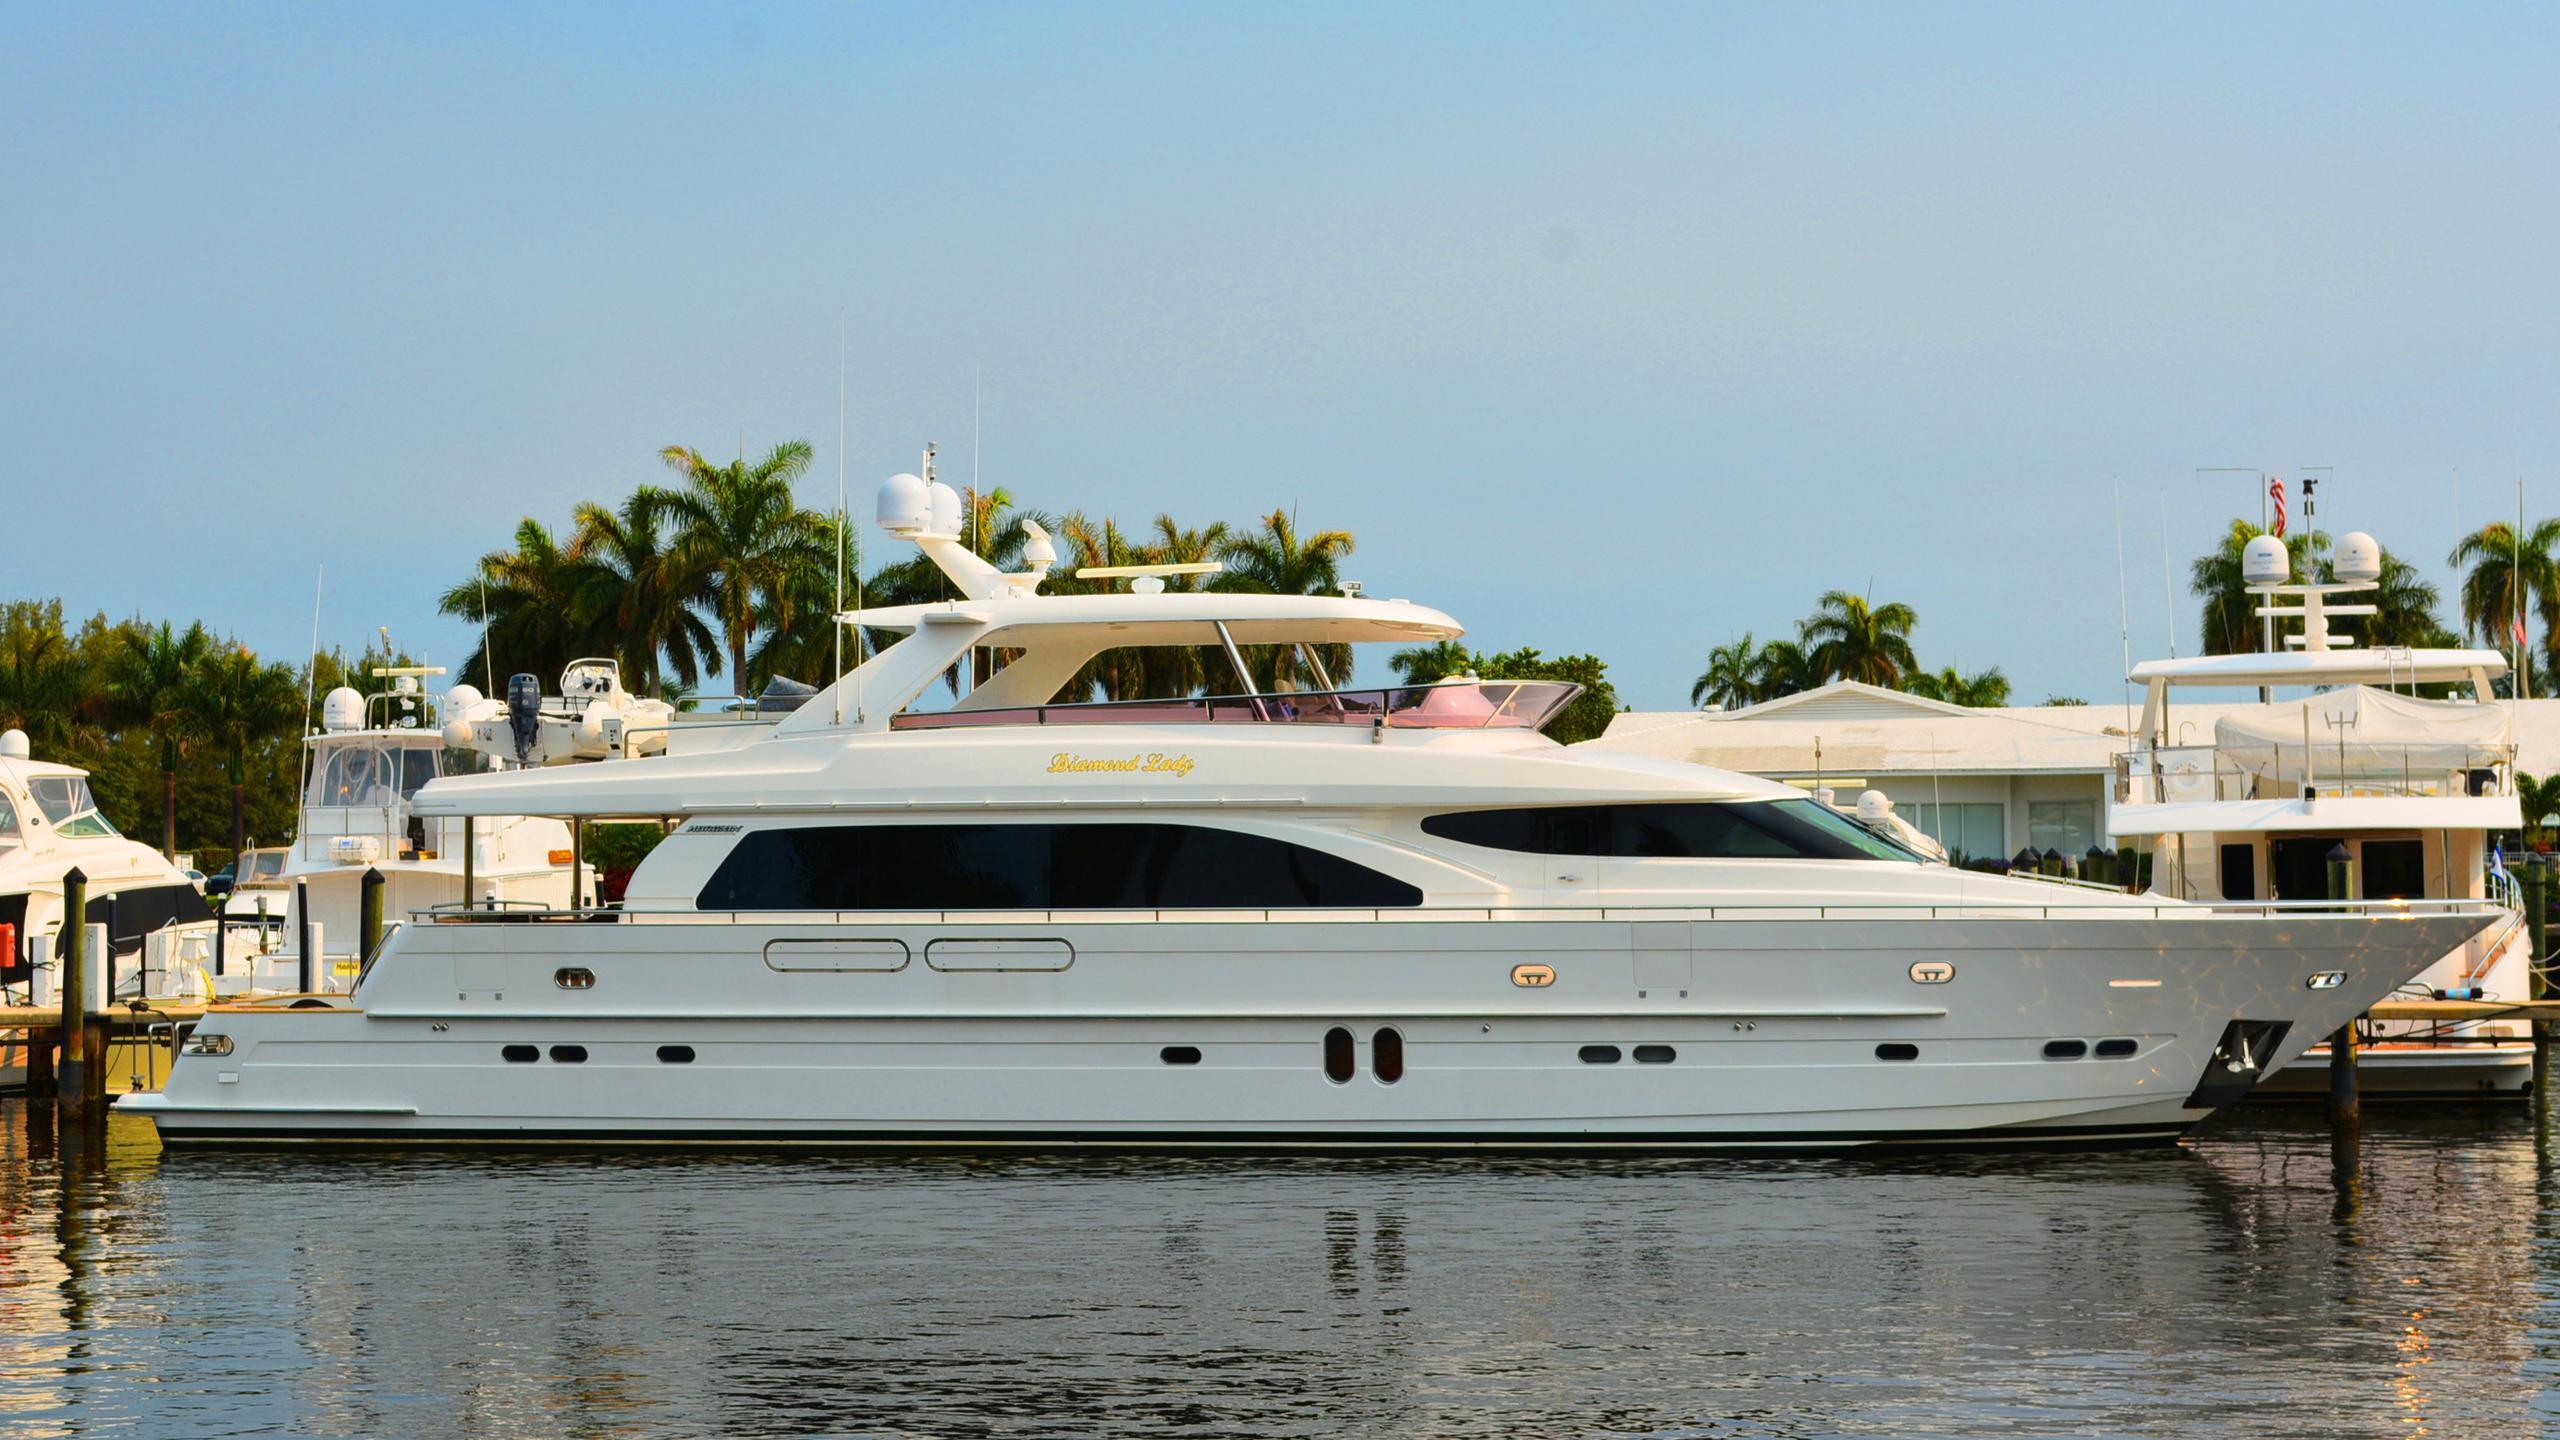 kentucky belle diamond lady motoryacht horizon 2004 29m profile